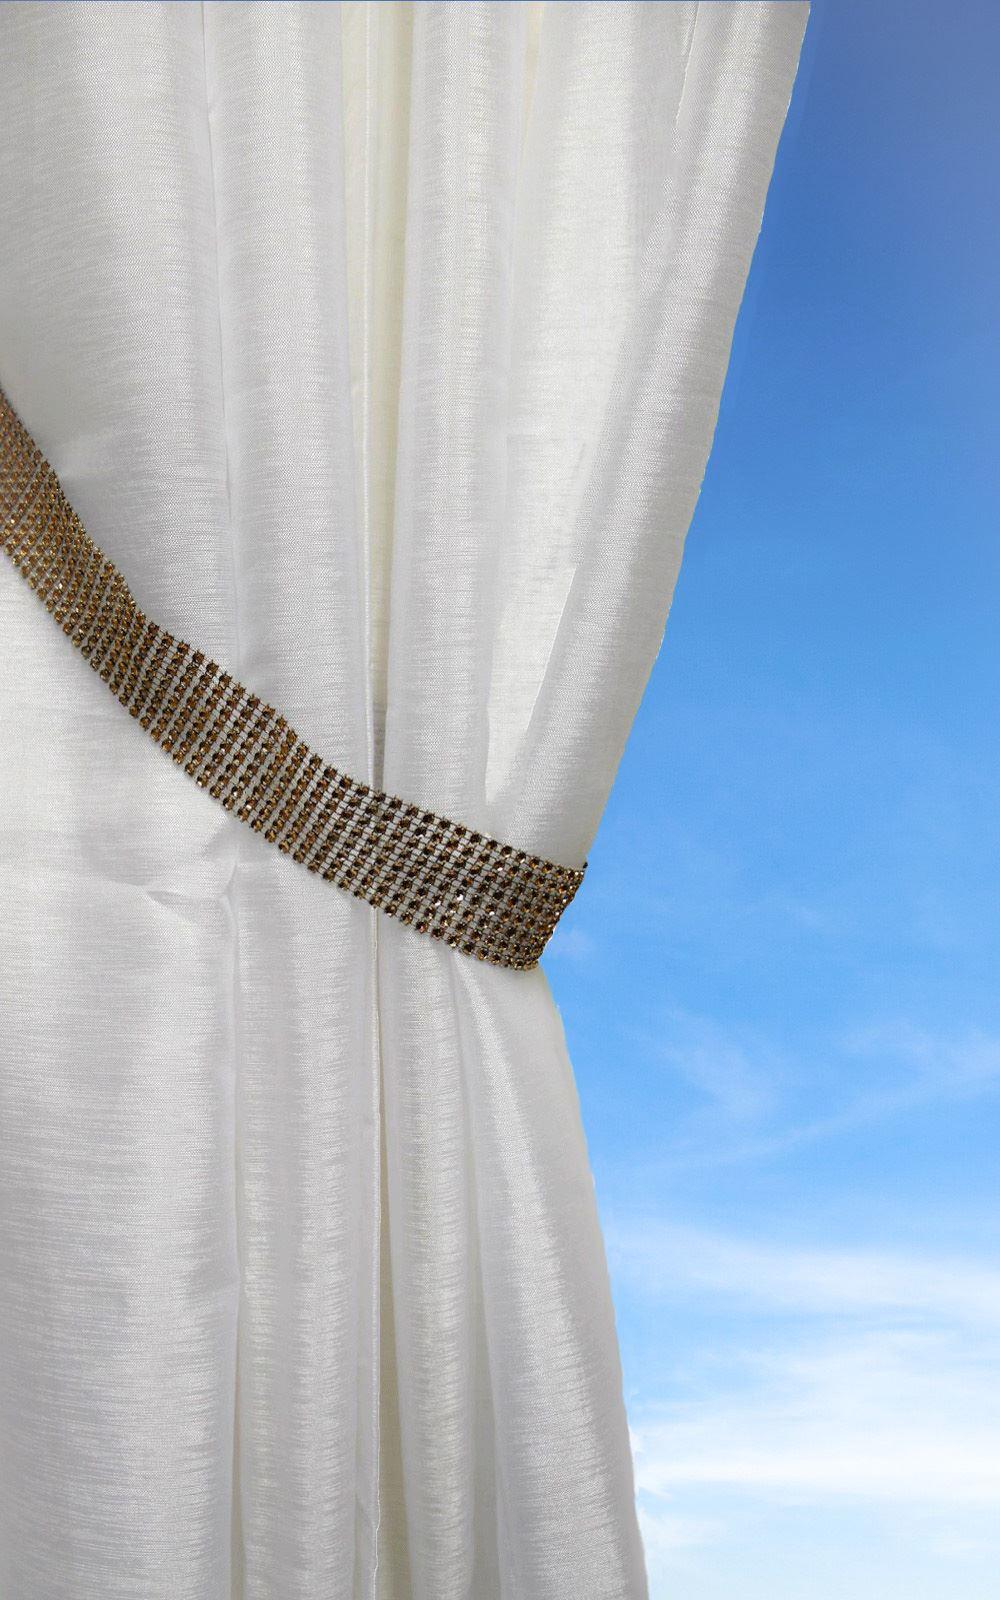 Rhiannon Bling Chain Curtain Tie Backs Sparkle Hold Back